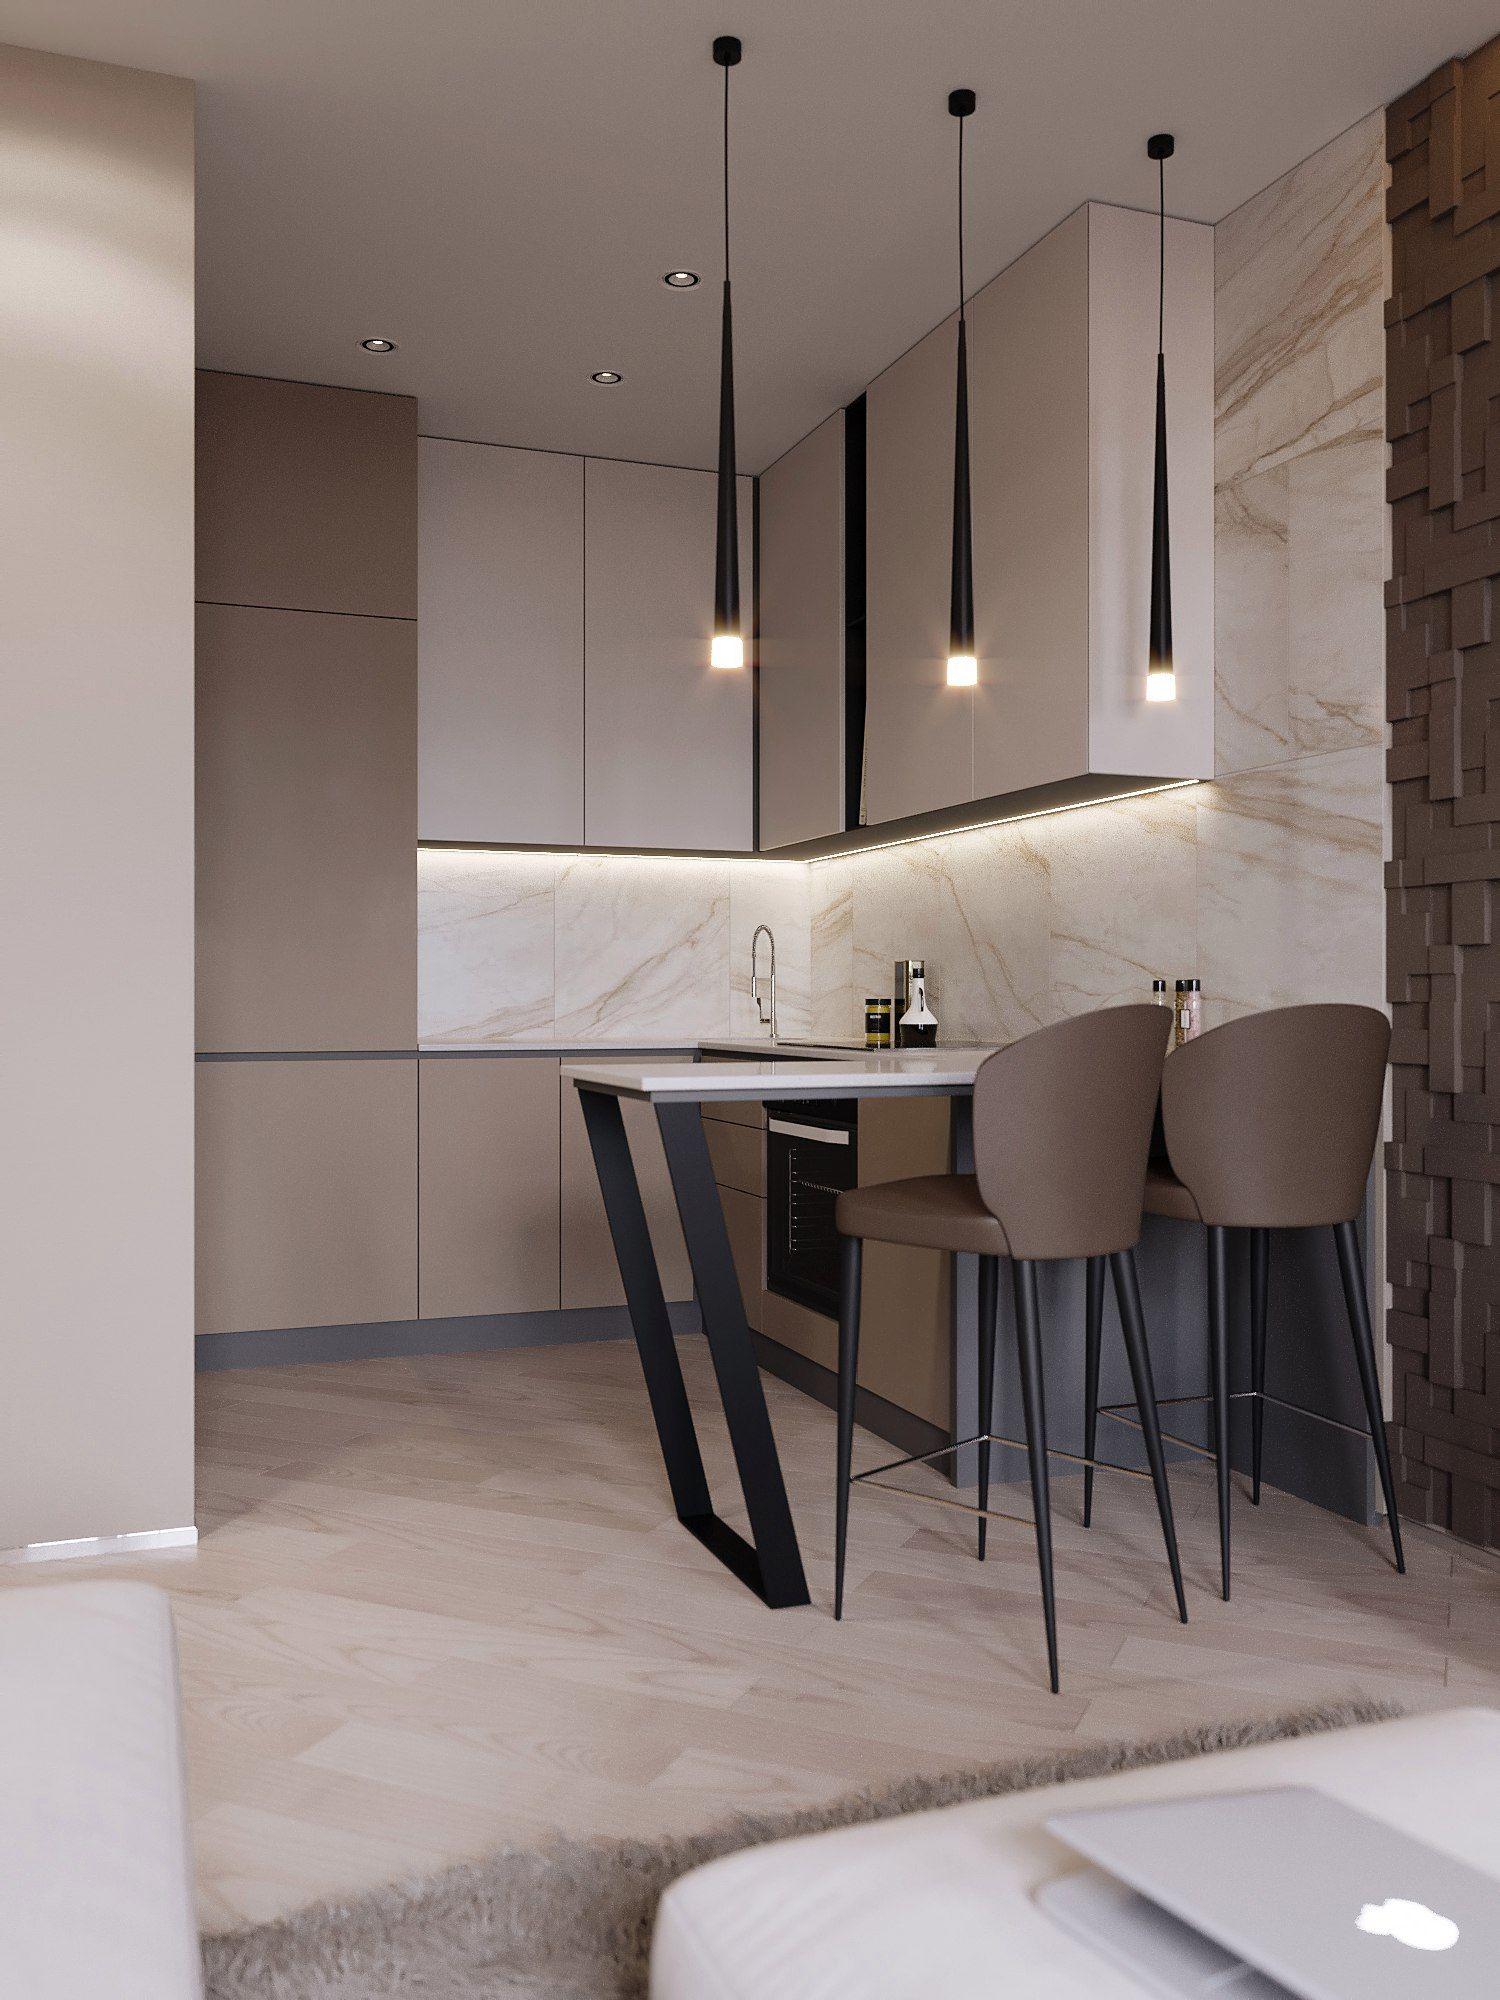 Z E T W I X | дизайн интерьера | Интерьер:кухня | Pinterest | Küche ...